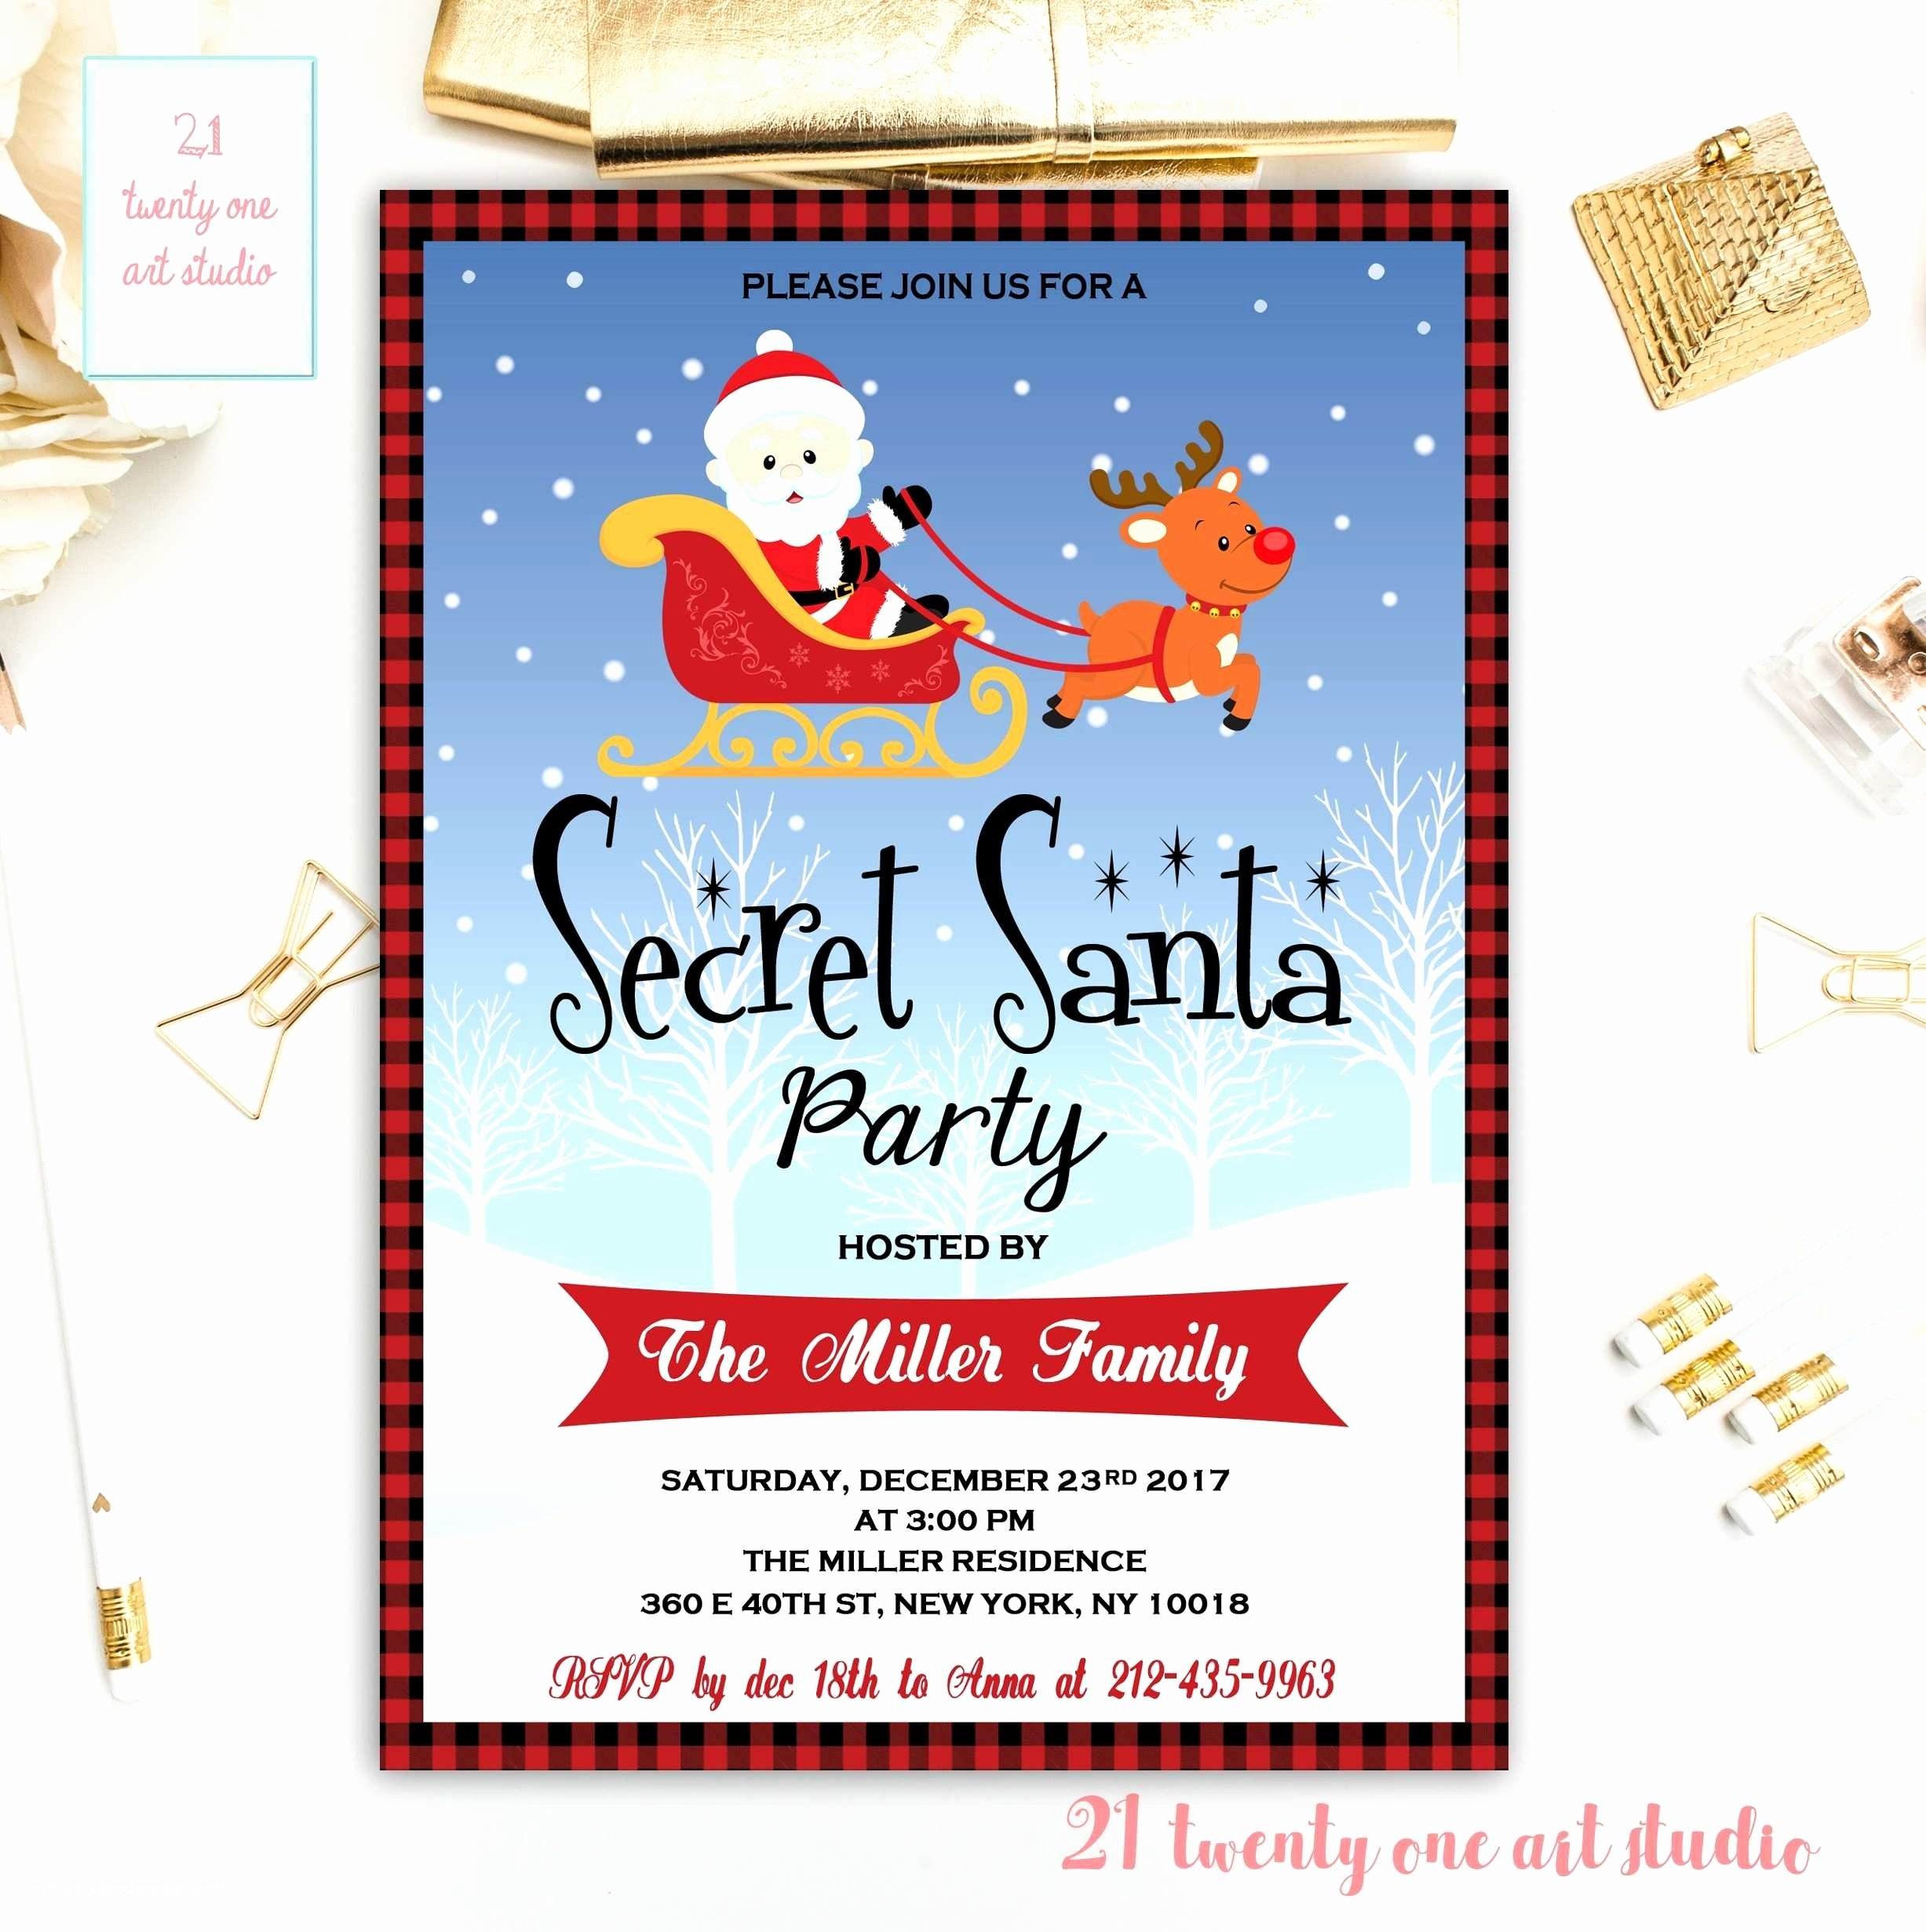 Lovely Print Christmas Cards Online | Birthday Card | Greeting Card - Free Printable Christmas Cards With Photo Insert